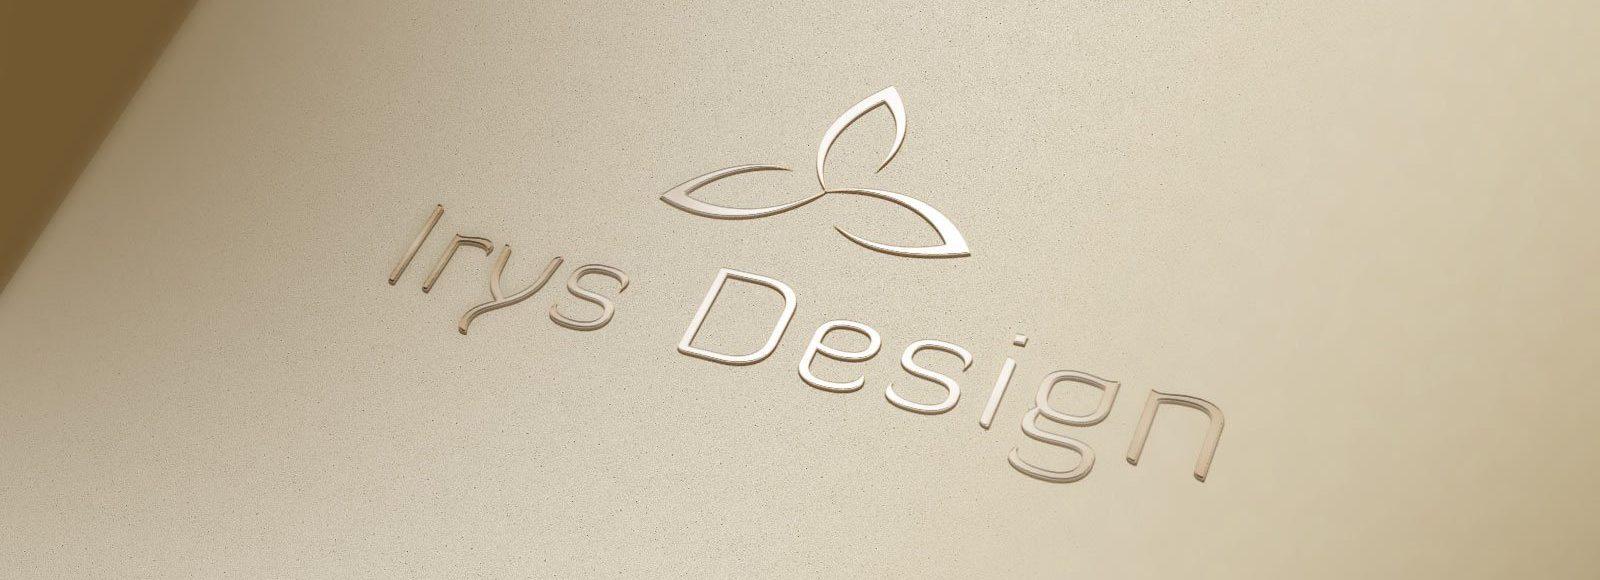 irys_design_slavonski_brod